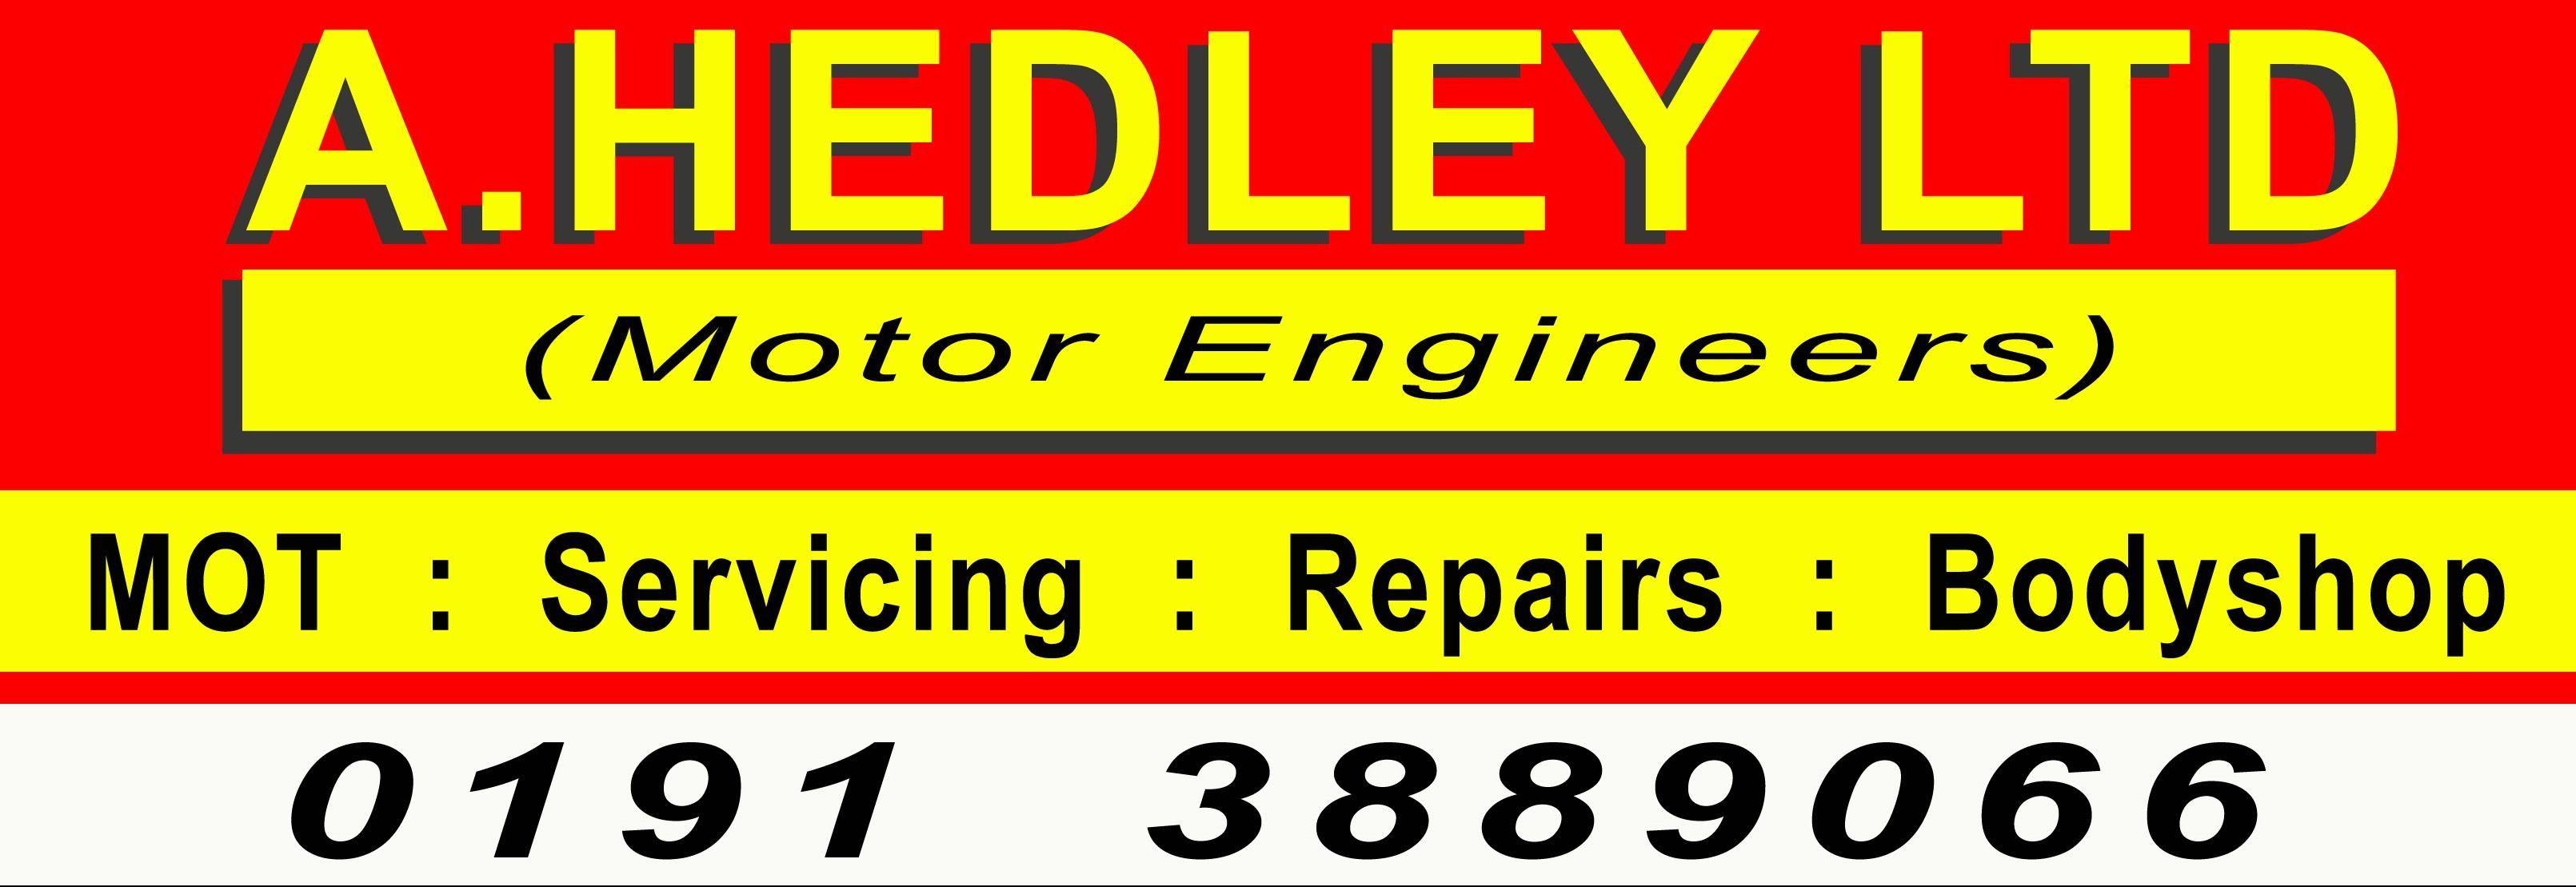 A HEDLEY (MOTOR ENGINEERS) LTD Logo